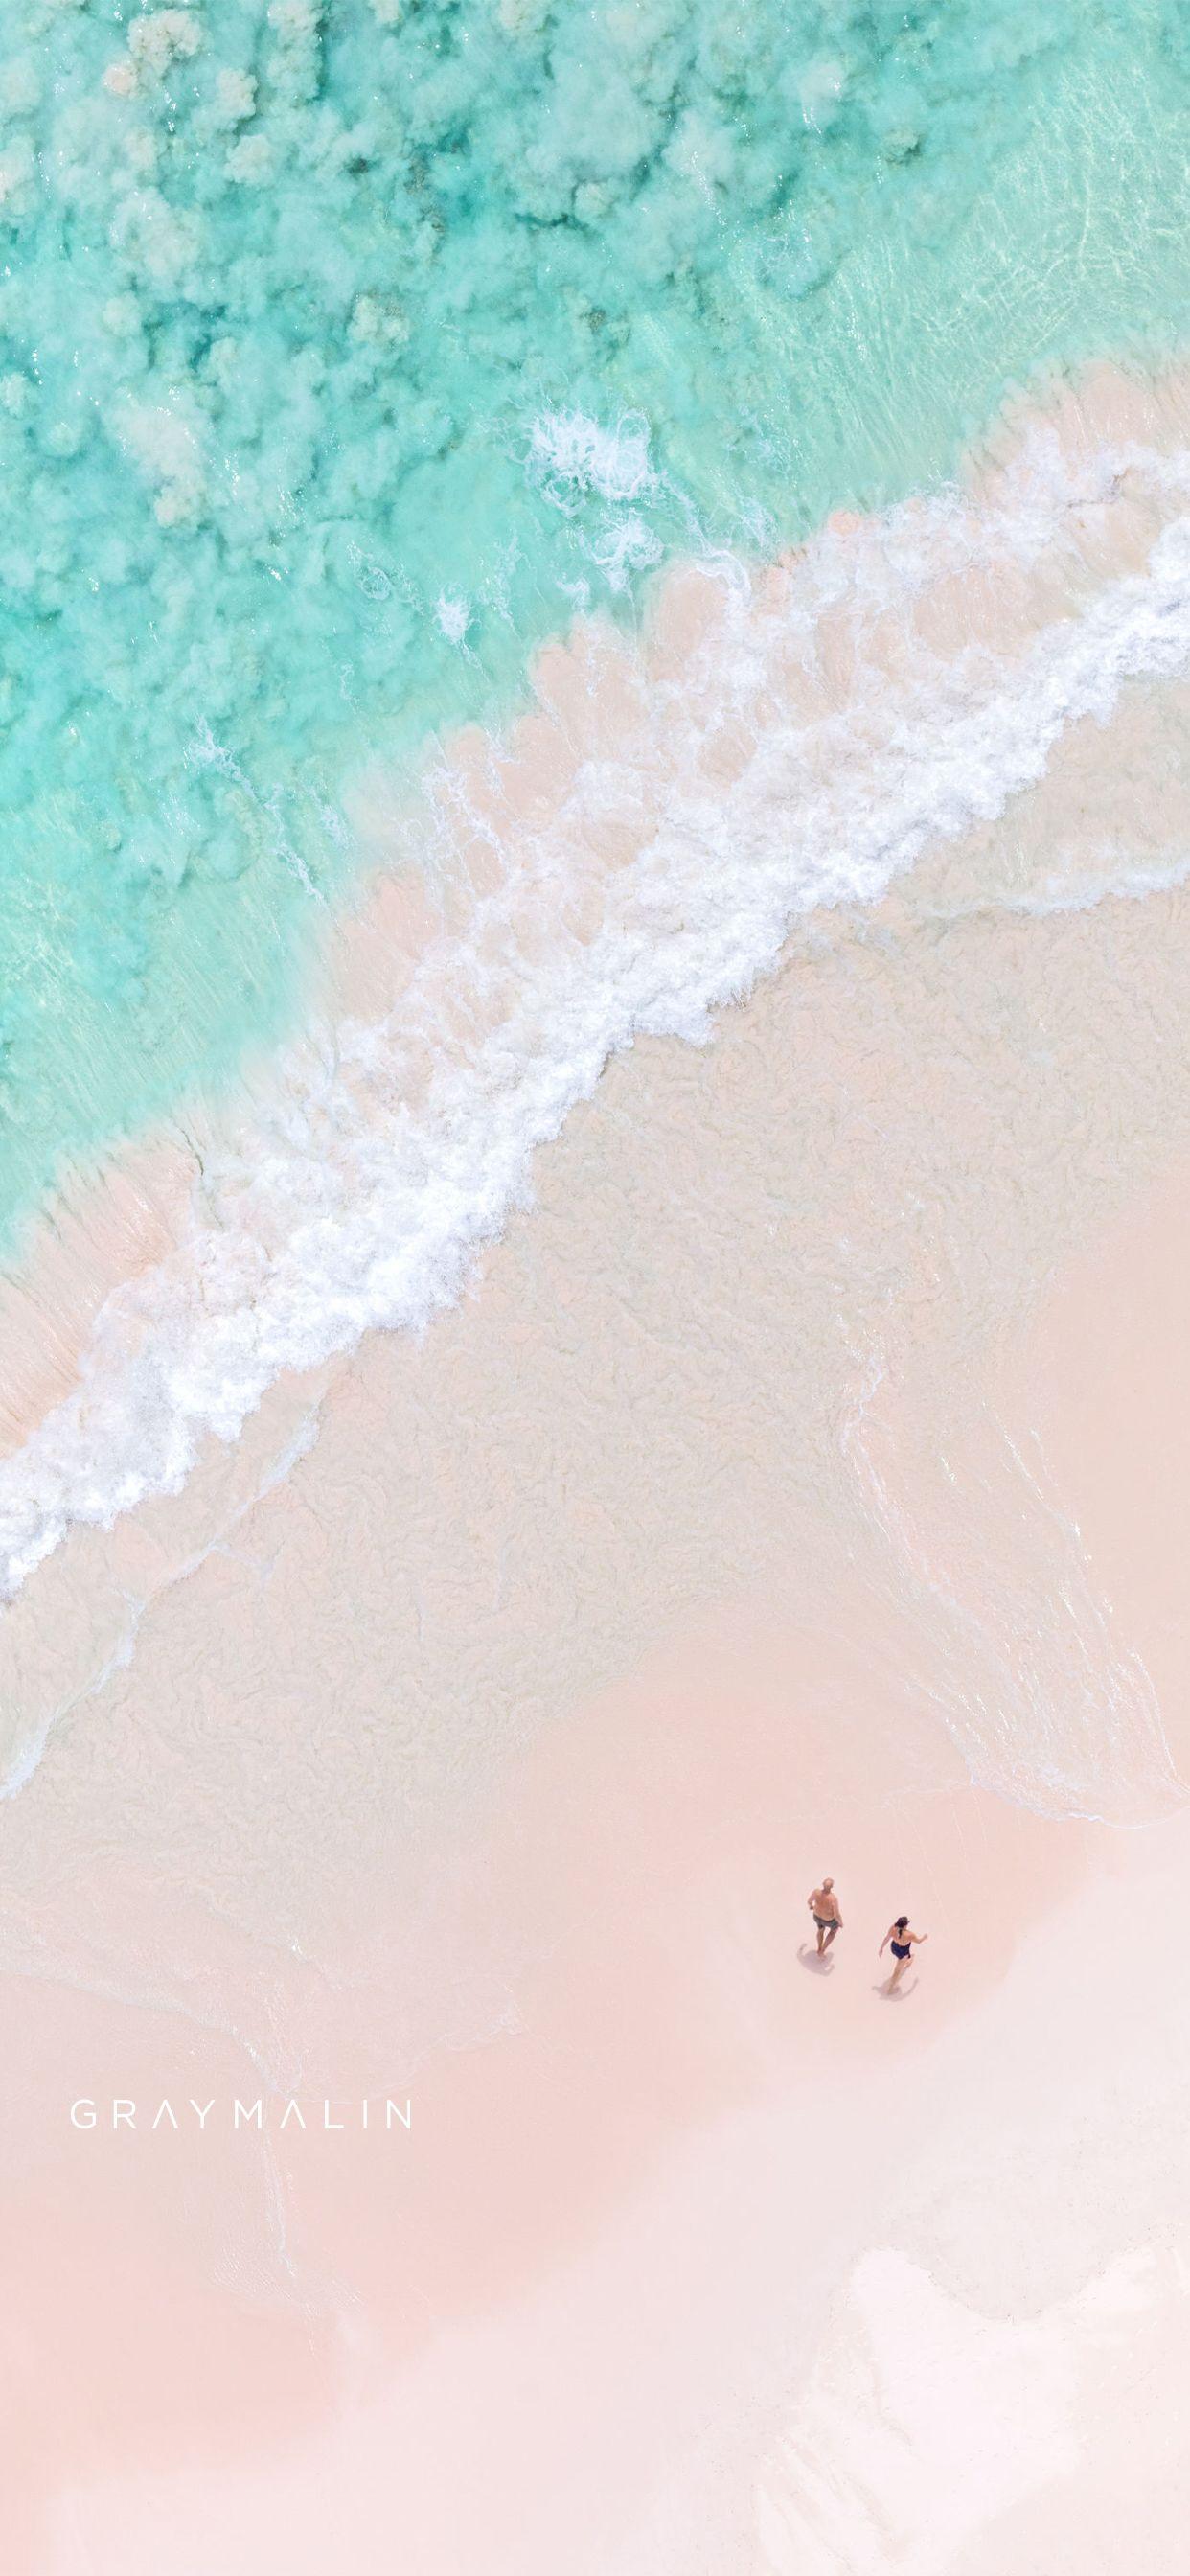 Phone Backgrounds from Gray Malin Gray Malin 1242x2688